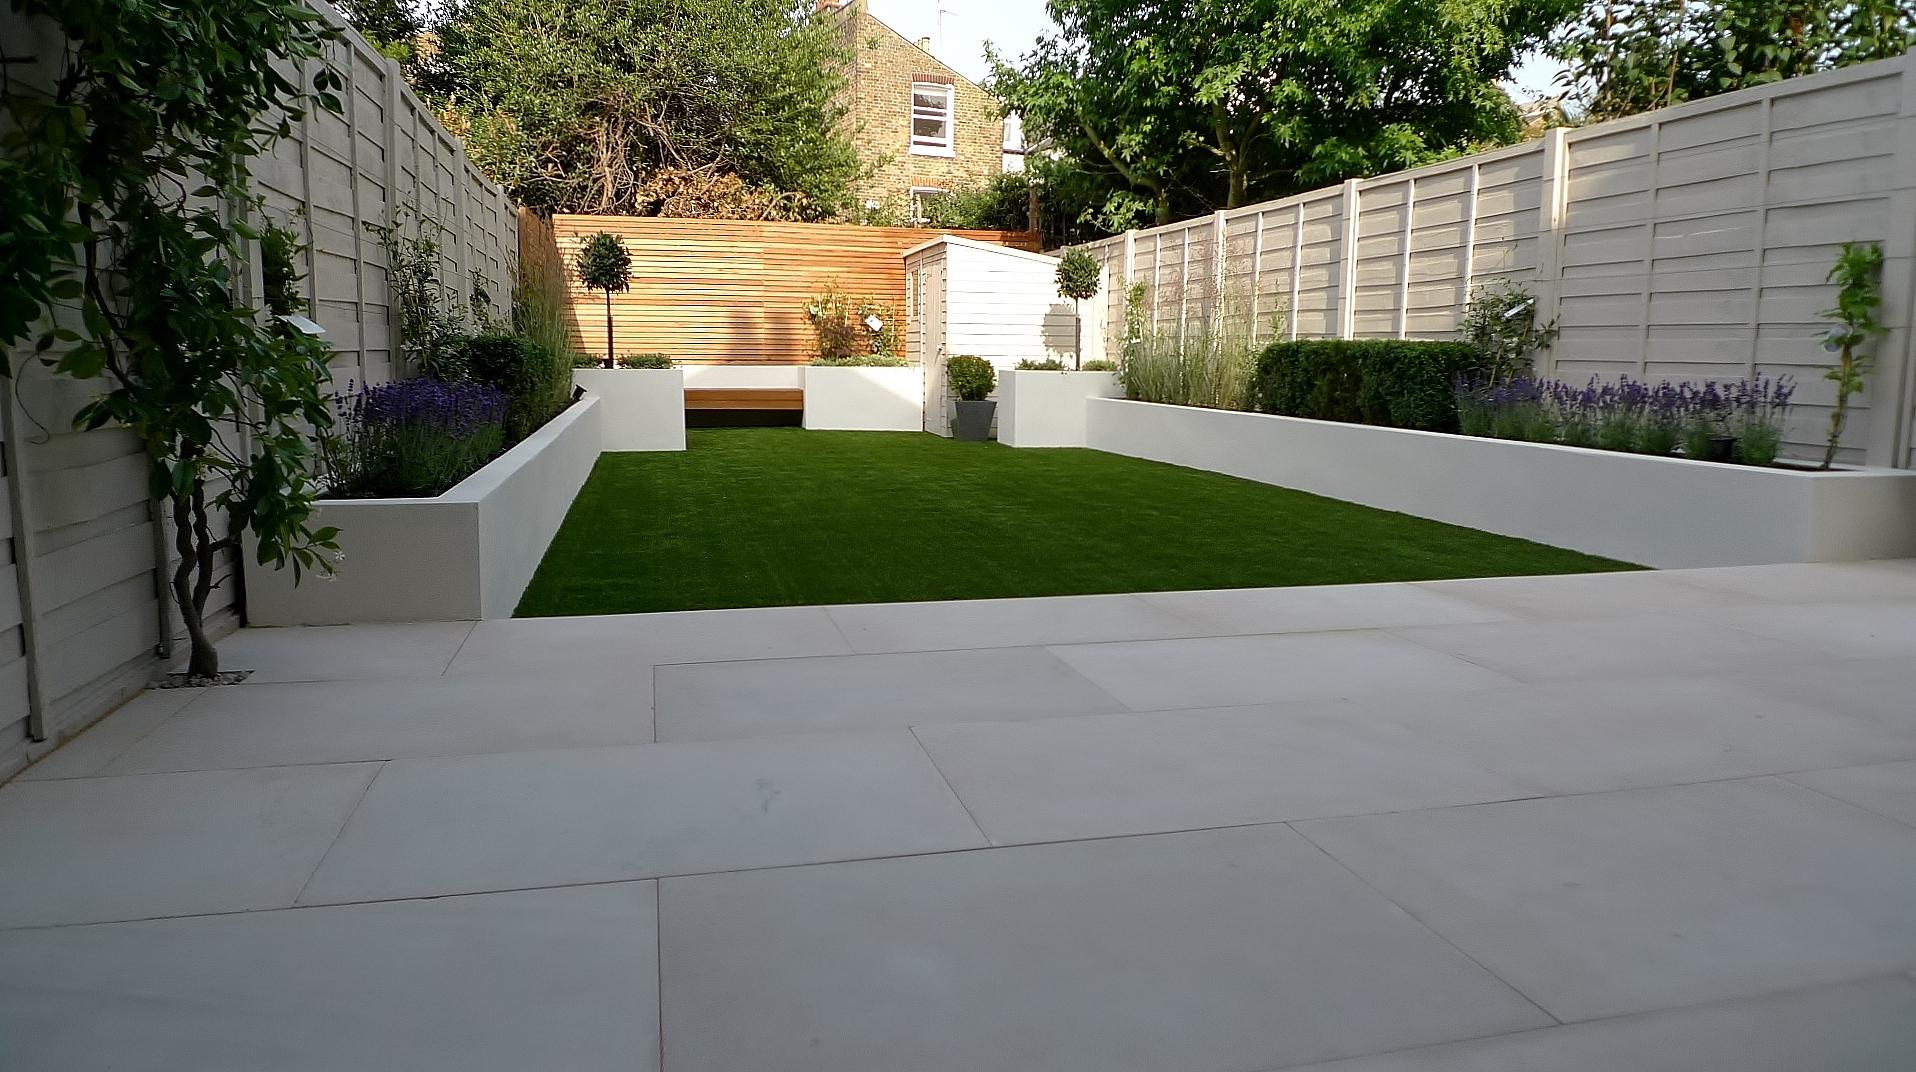 Backyard Landscape Design | As4less